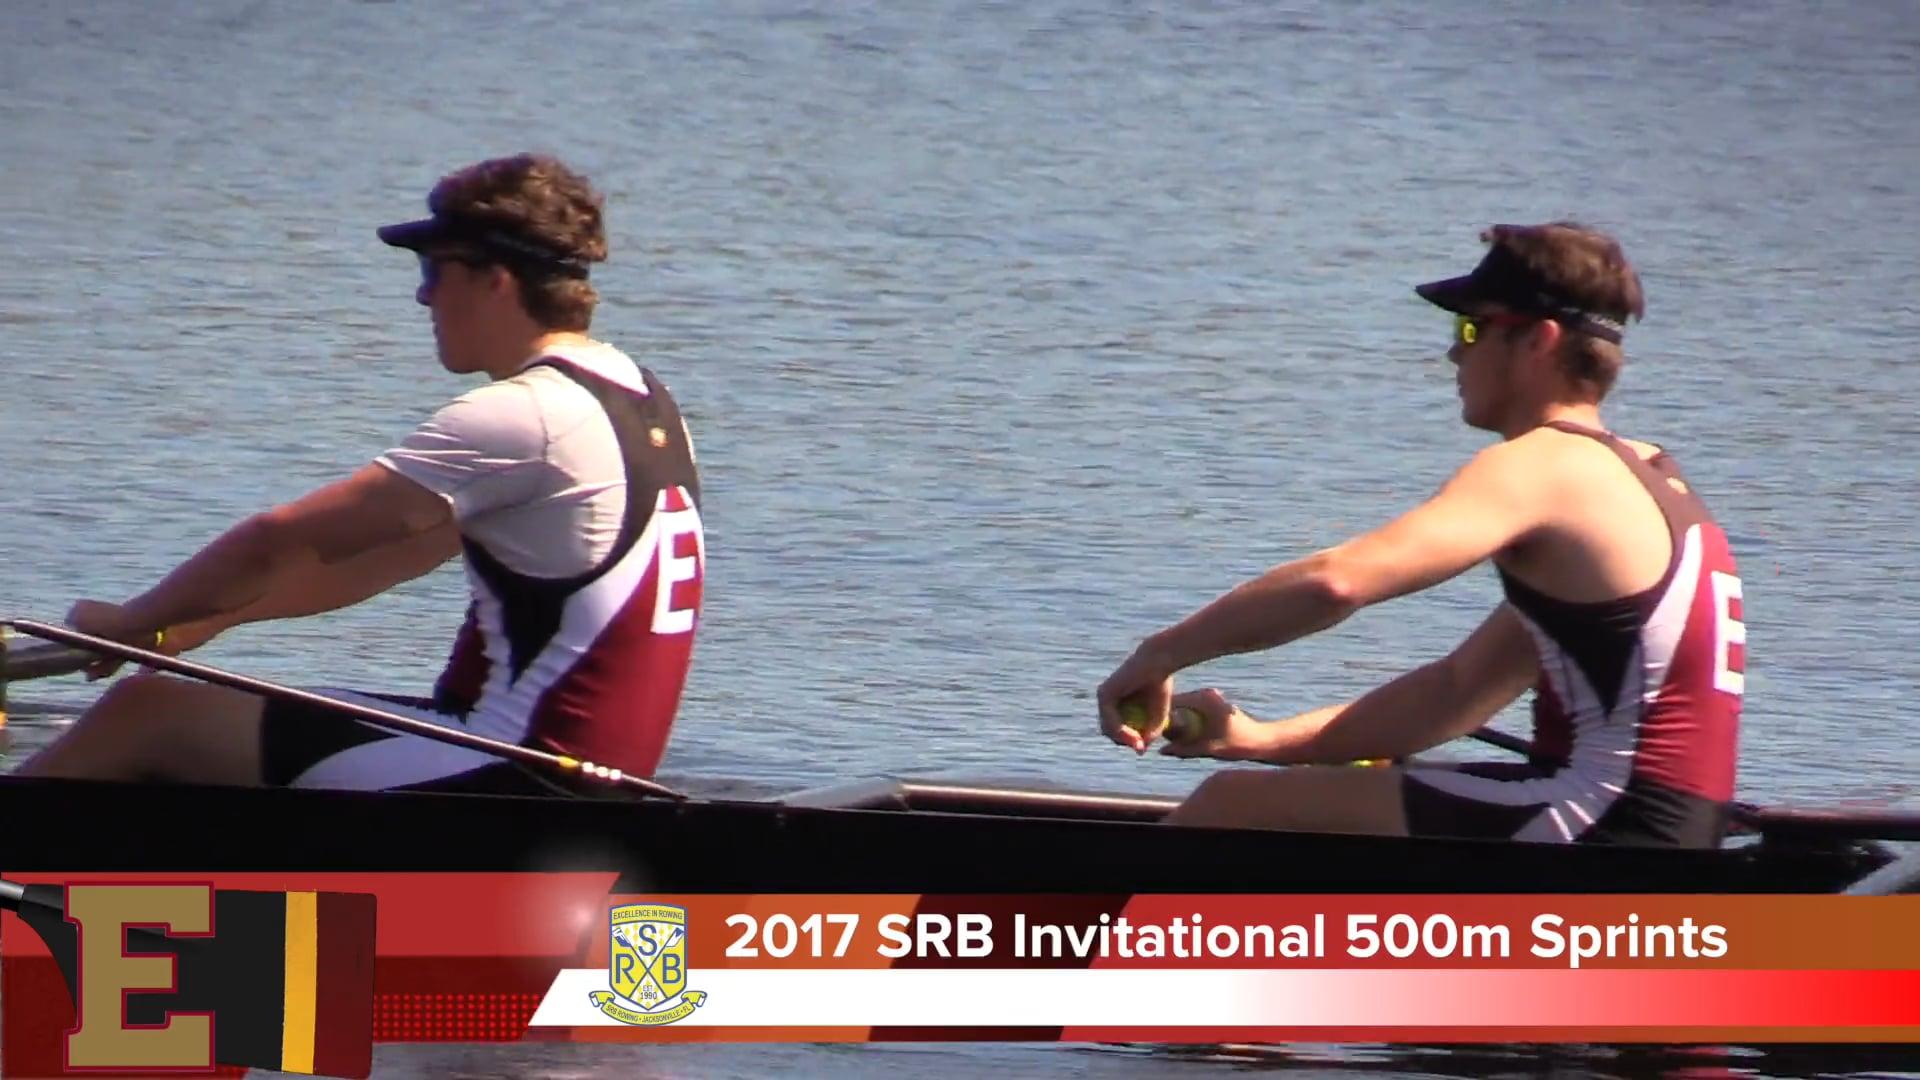 SRB Invitational 500m Sprints